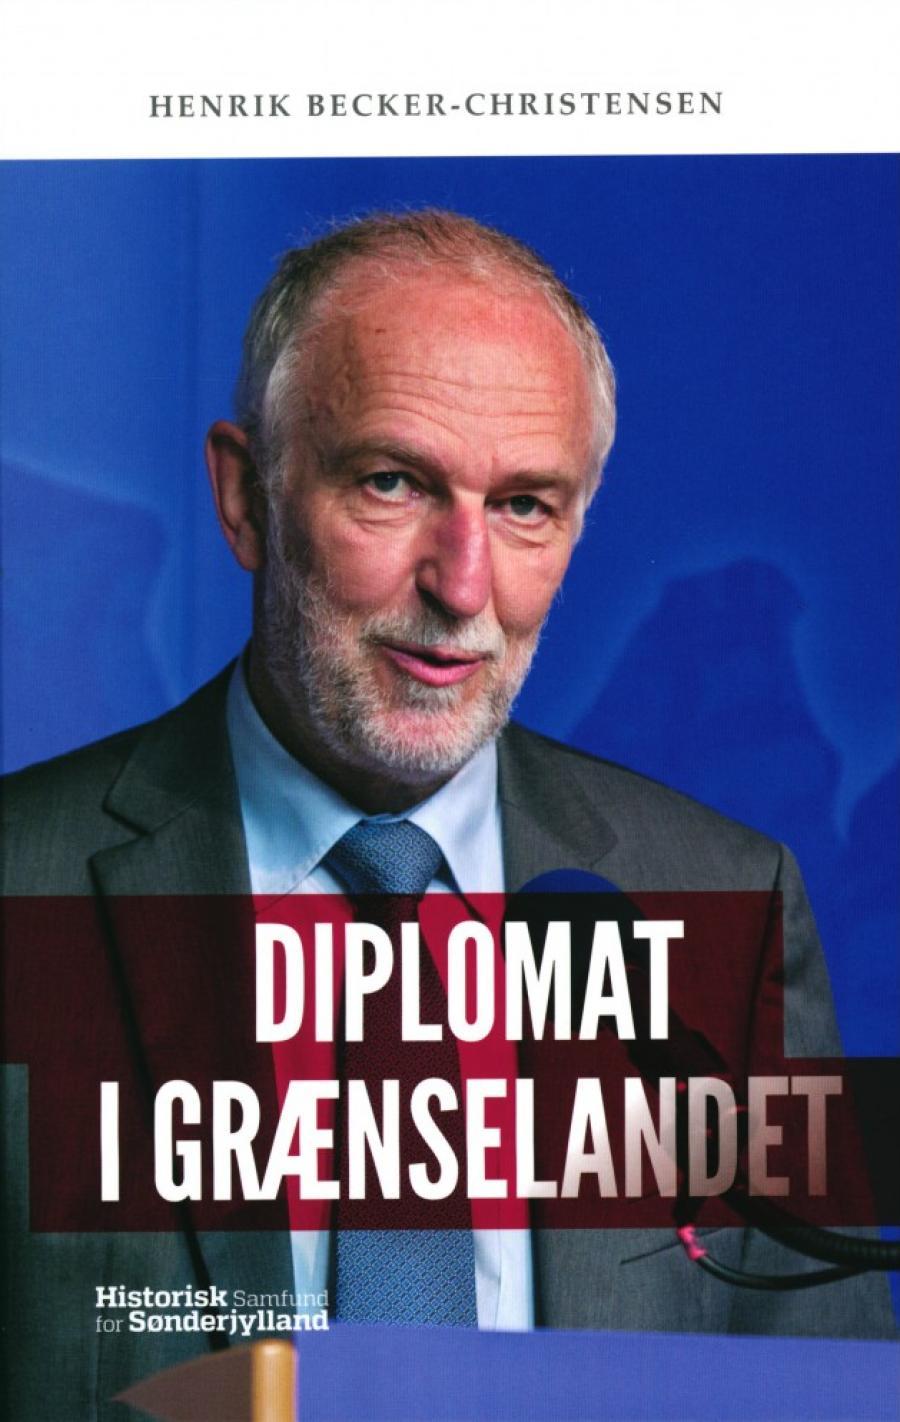 Henrik Becker-Christensen - Diplomat i grænselandet